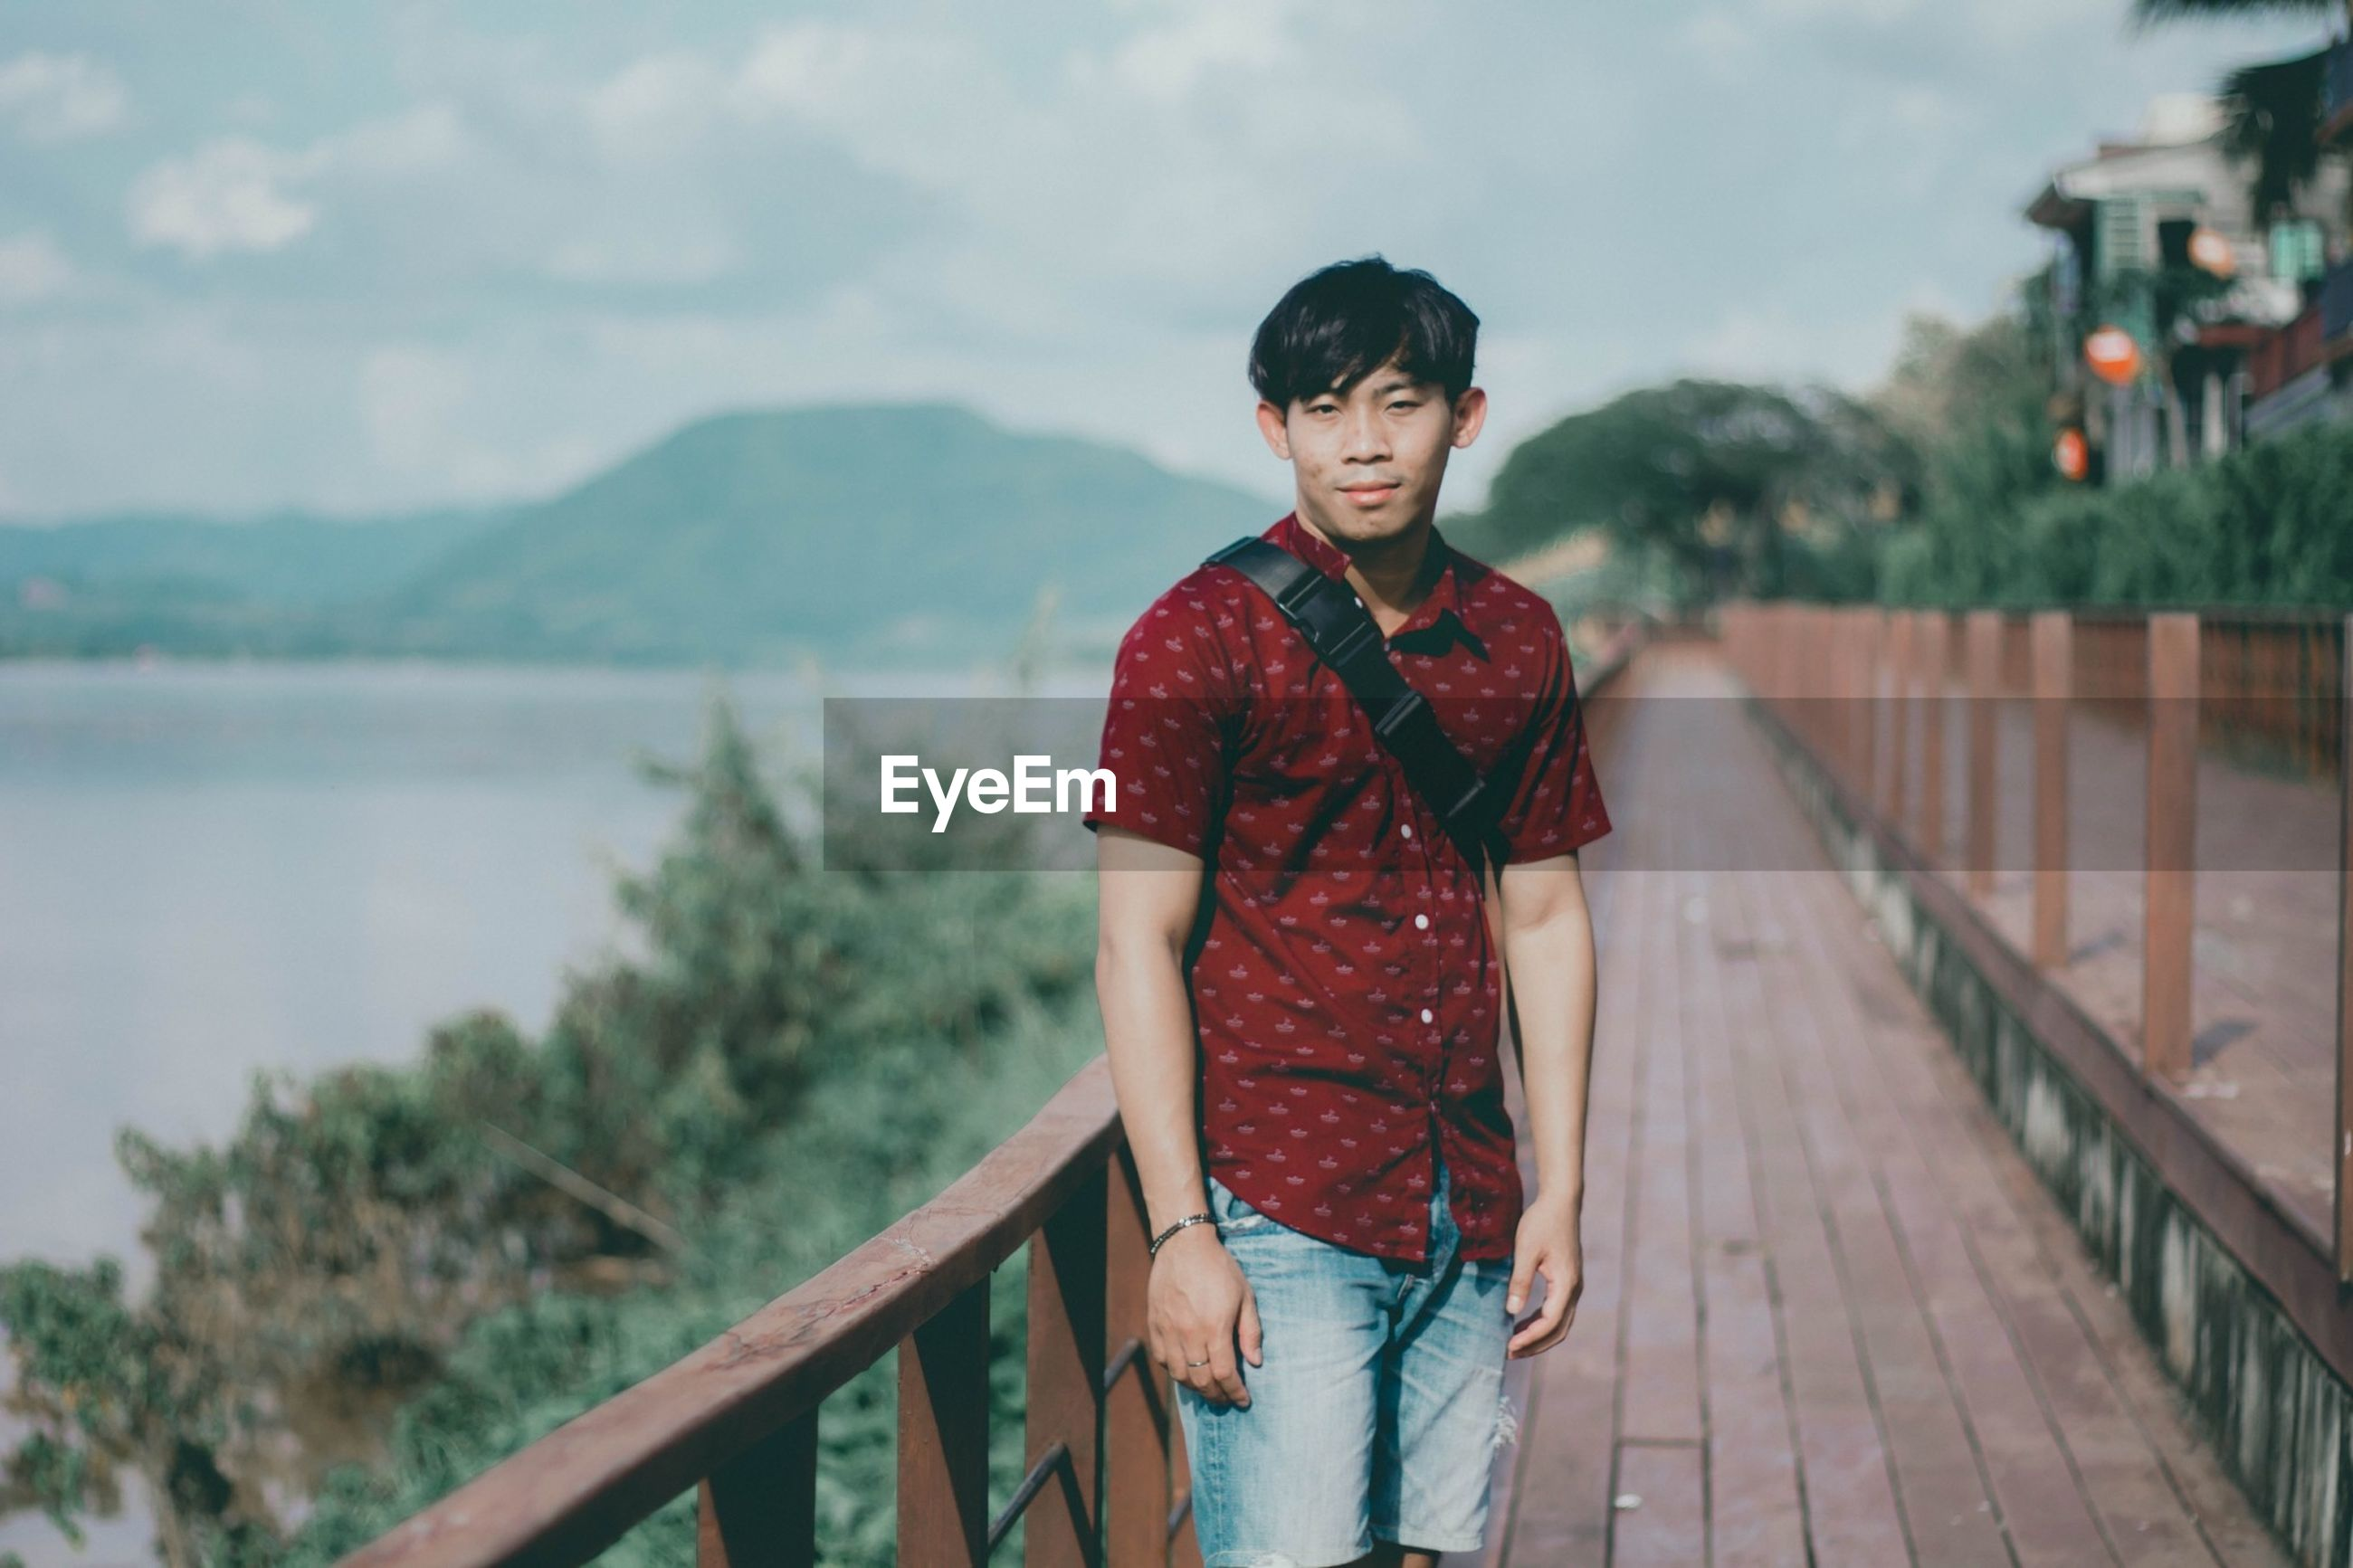 Portrait of young man standing on footbridge